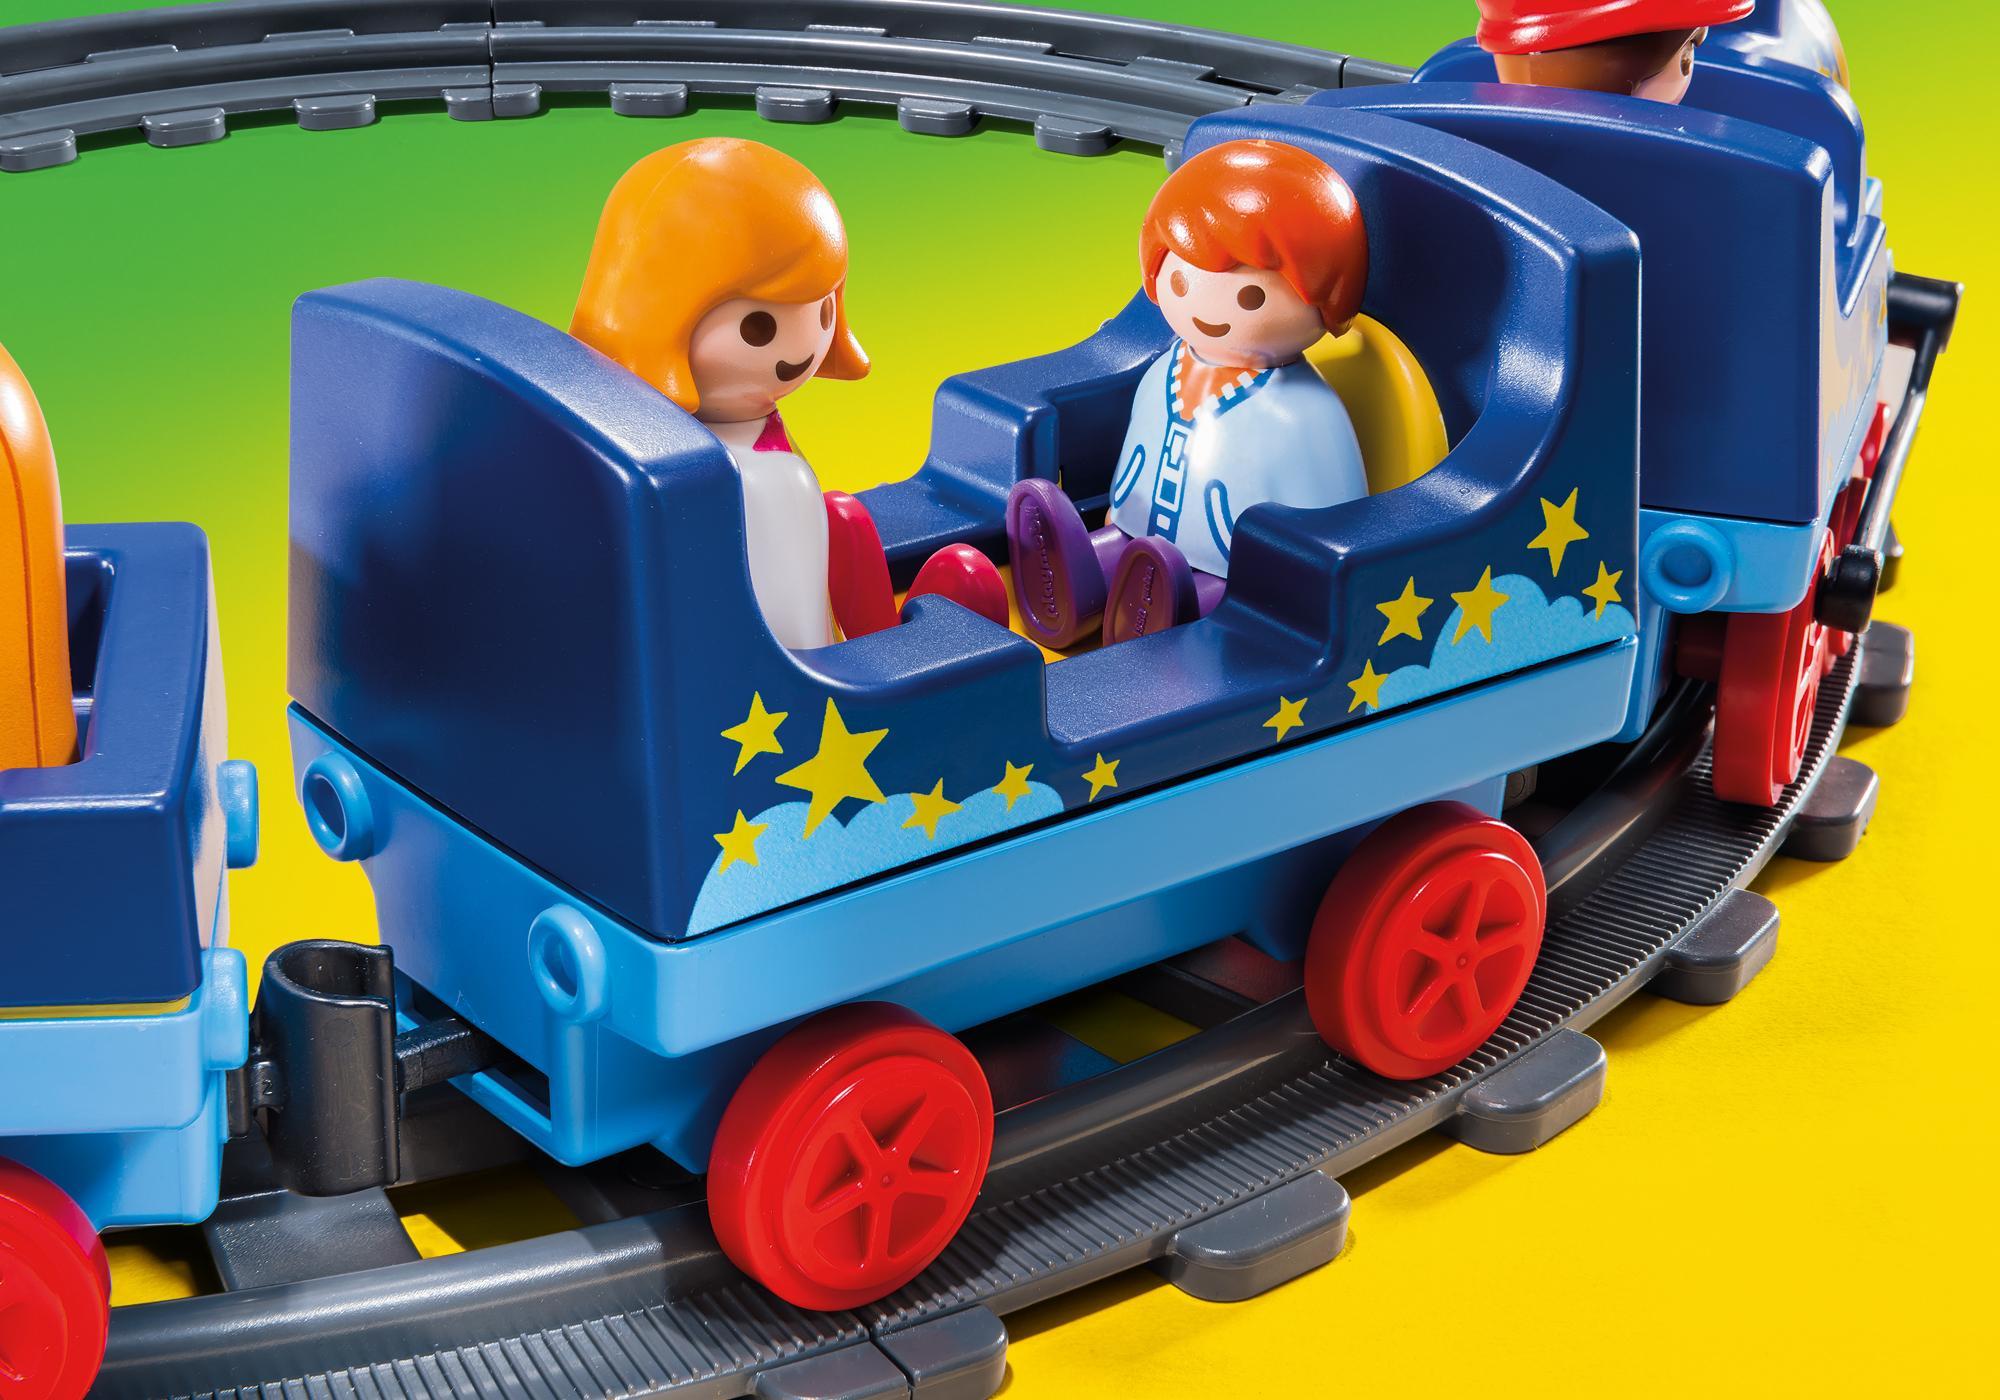 http://media.playmobil.com/i/playmobil/6880_product_extra1/Night Train with Track